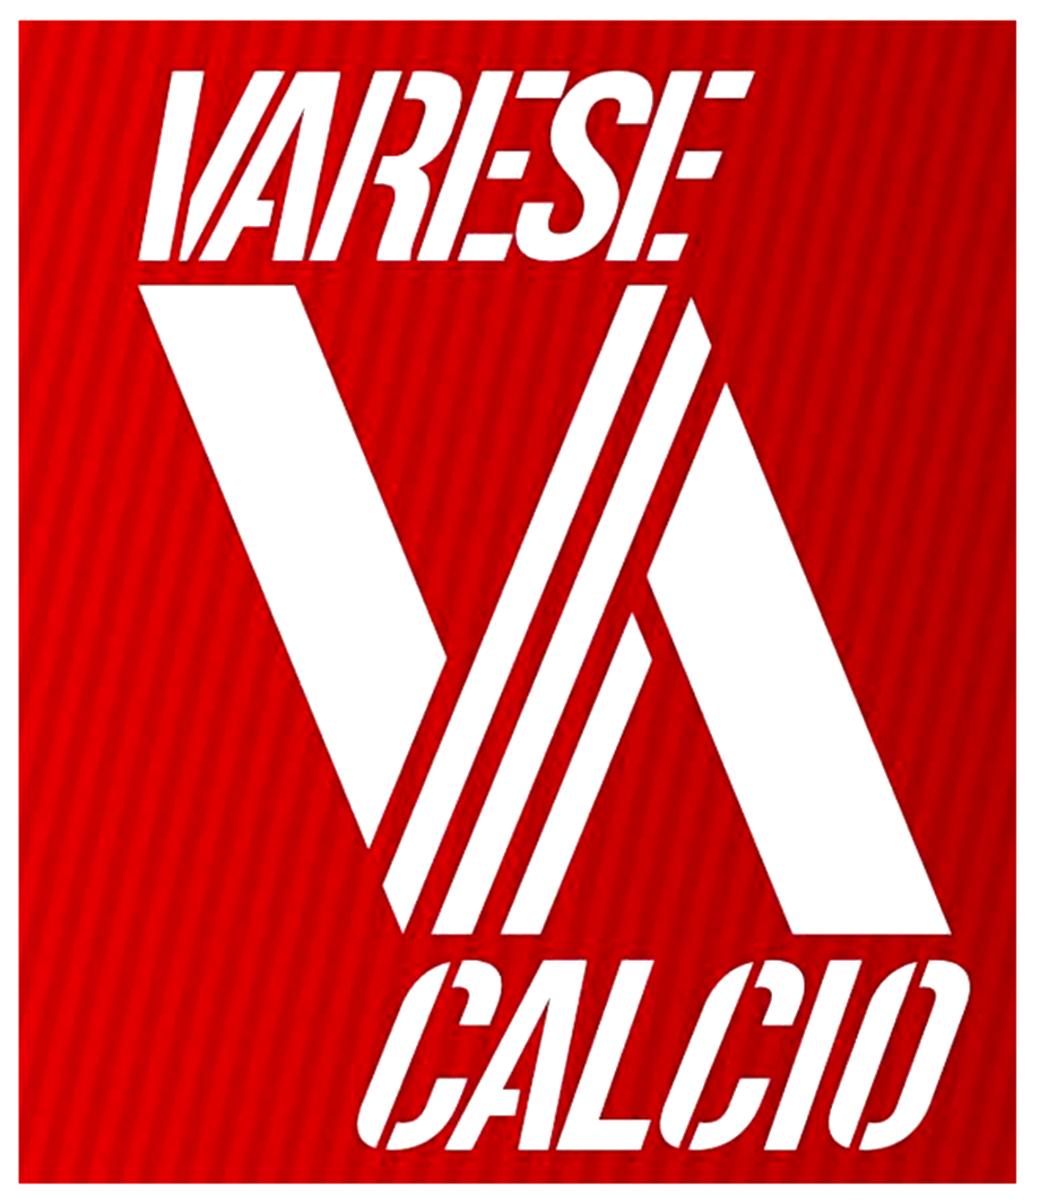 Calendario Calcio.Varese Calcio Calendario Squadra Lombardia Eccellenza